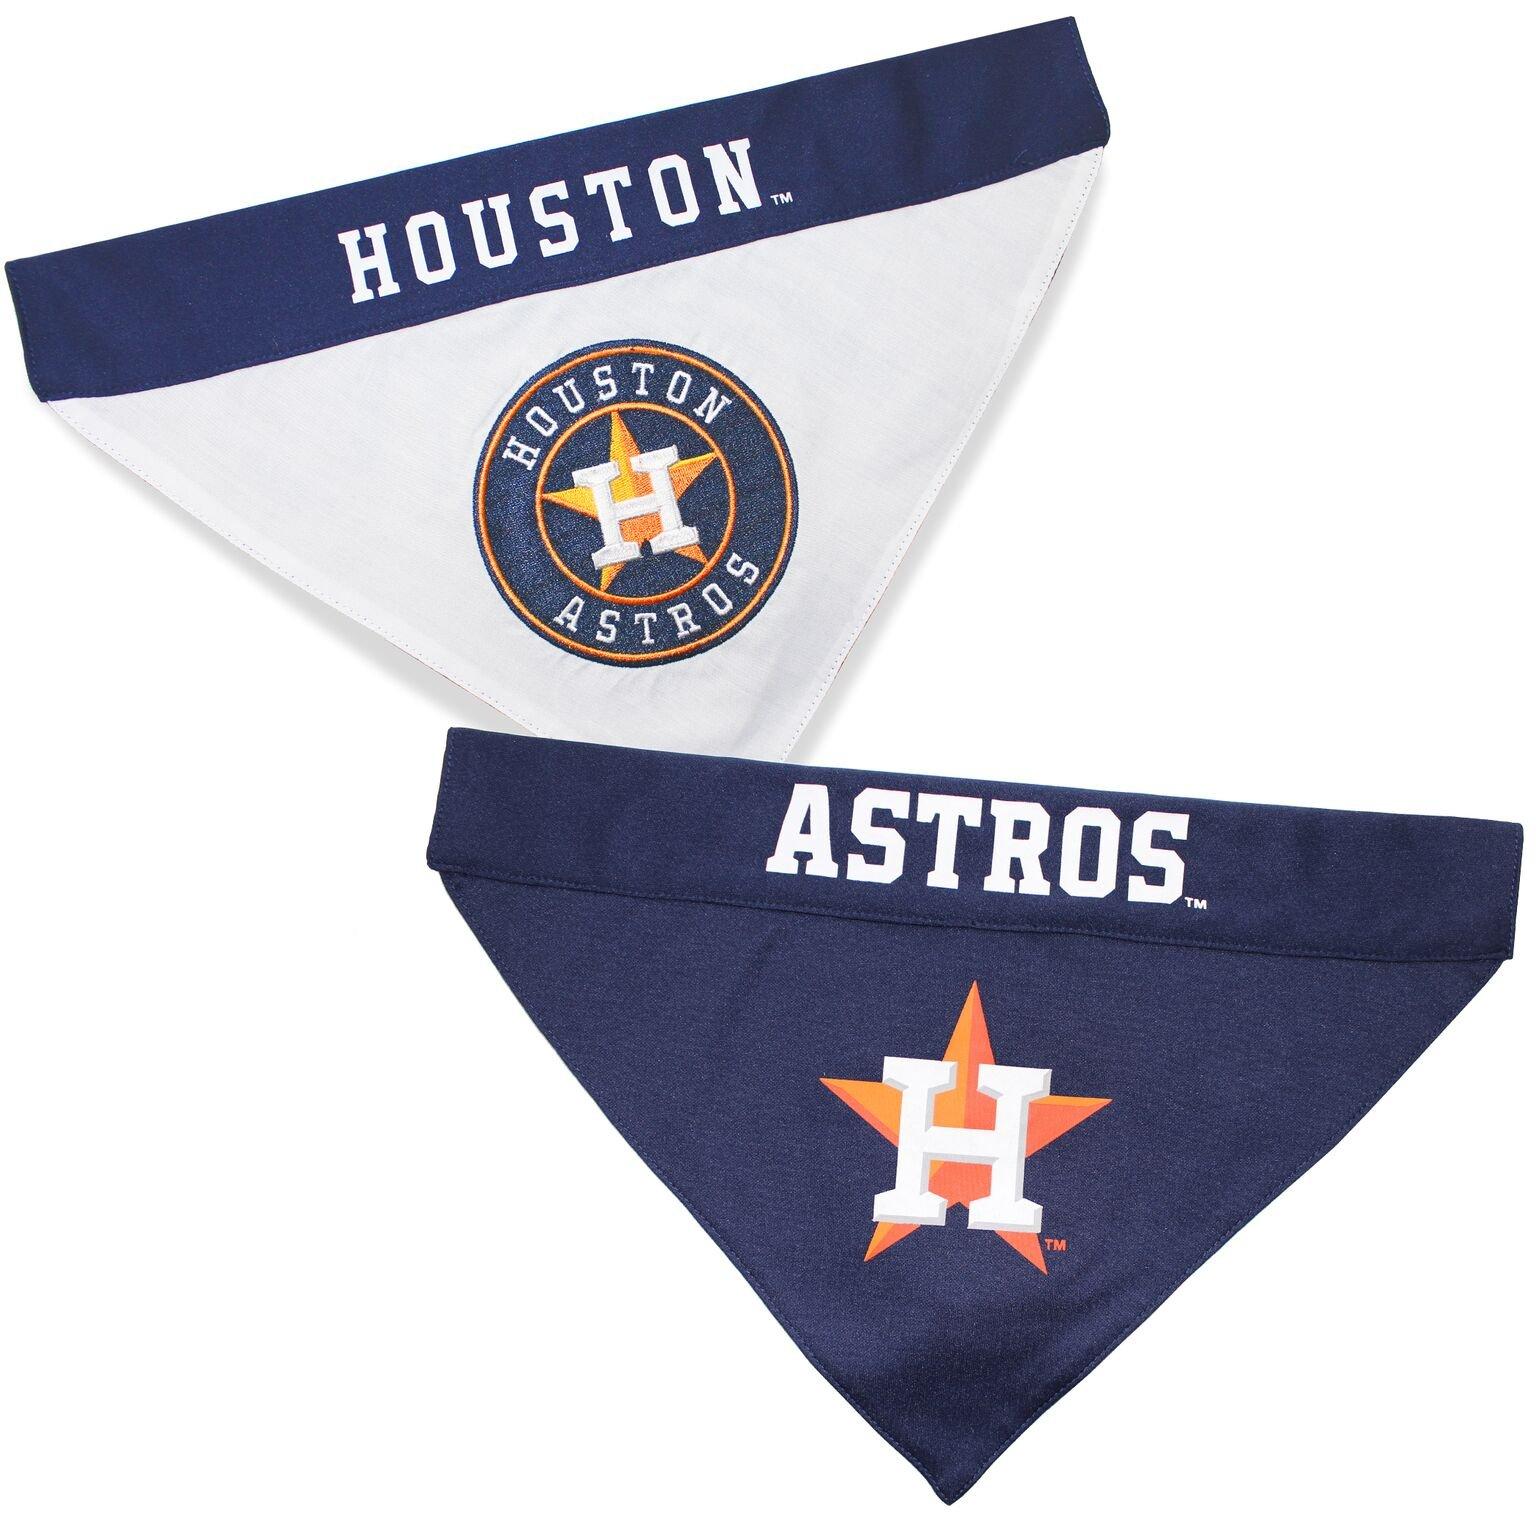 Pets First AST-3217-L-XL MLB Houston Astros Reversible Pet Bandana, Large/X-Large, MLB Team Color